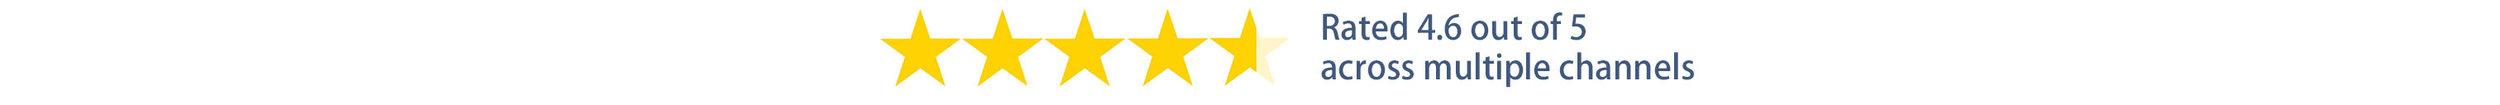 5-stars.jpg